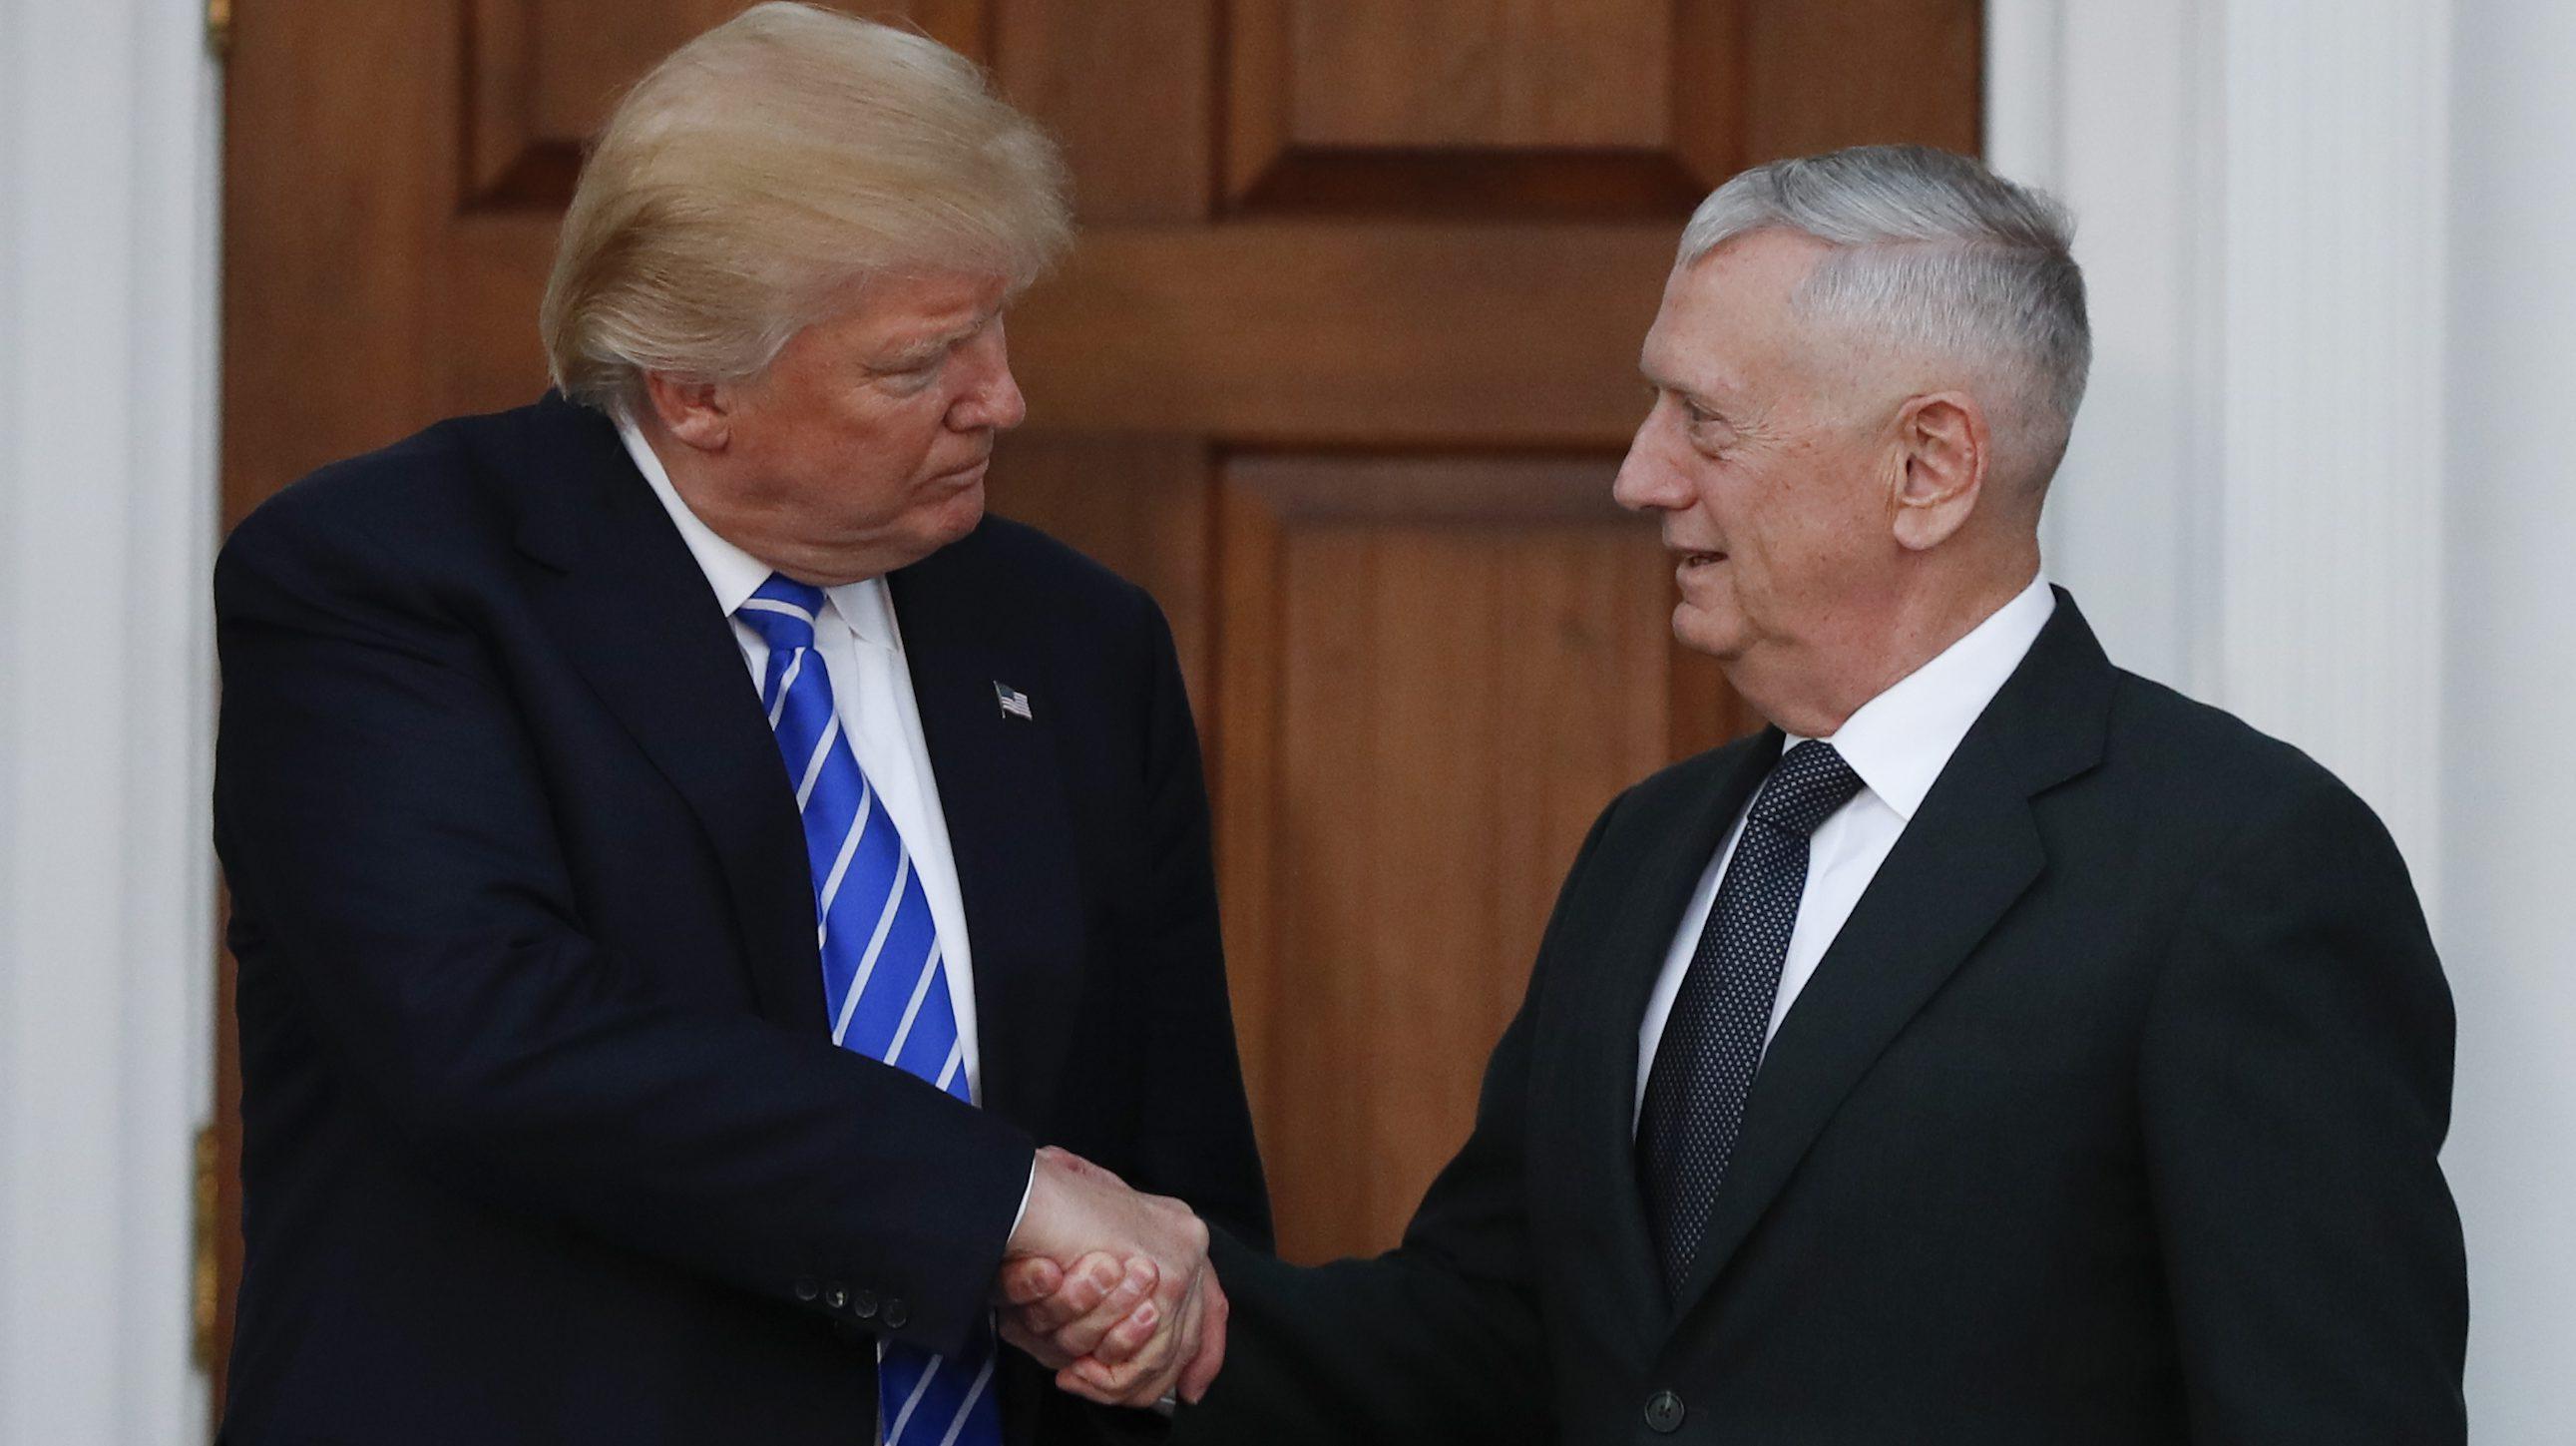 President-elect Donald Trump shakes hands with retired Marine Corps Gen. James Mattis